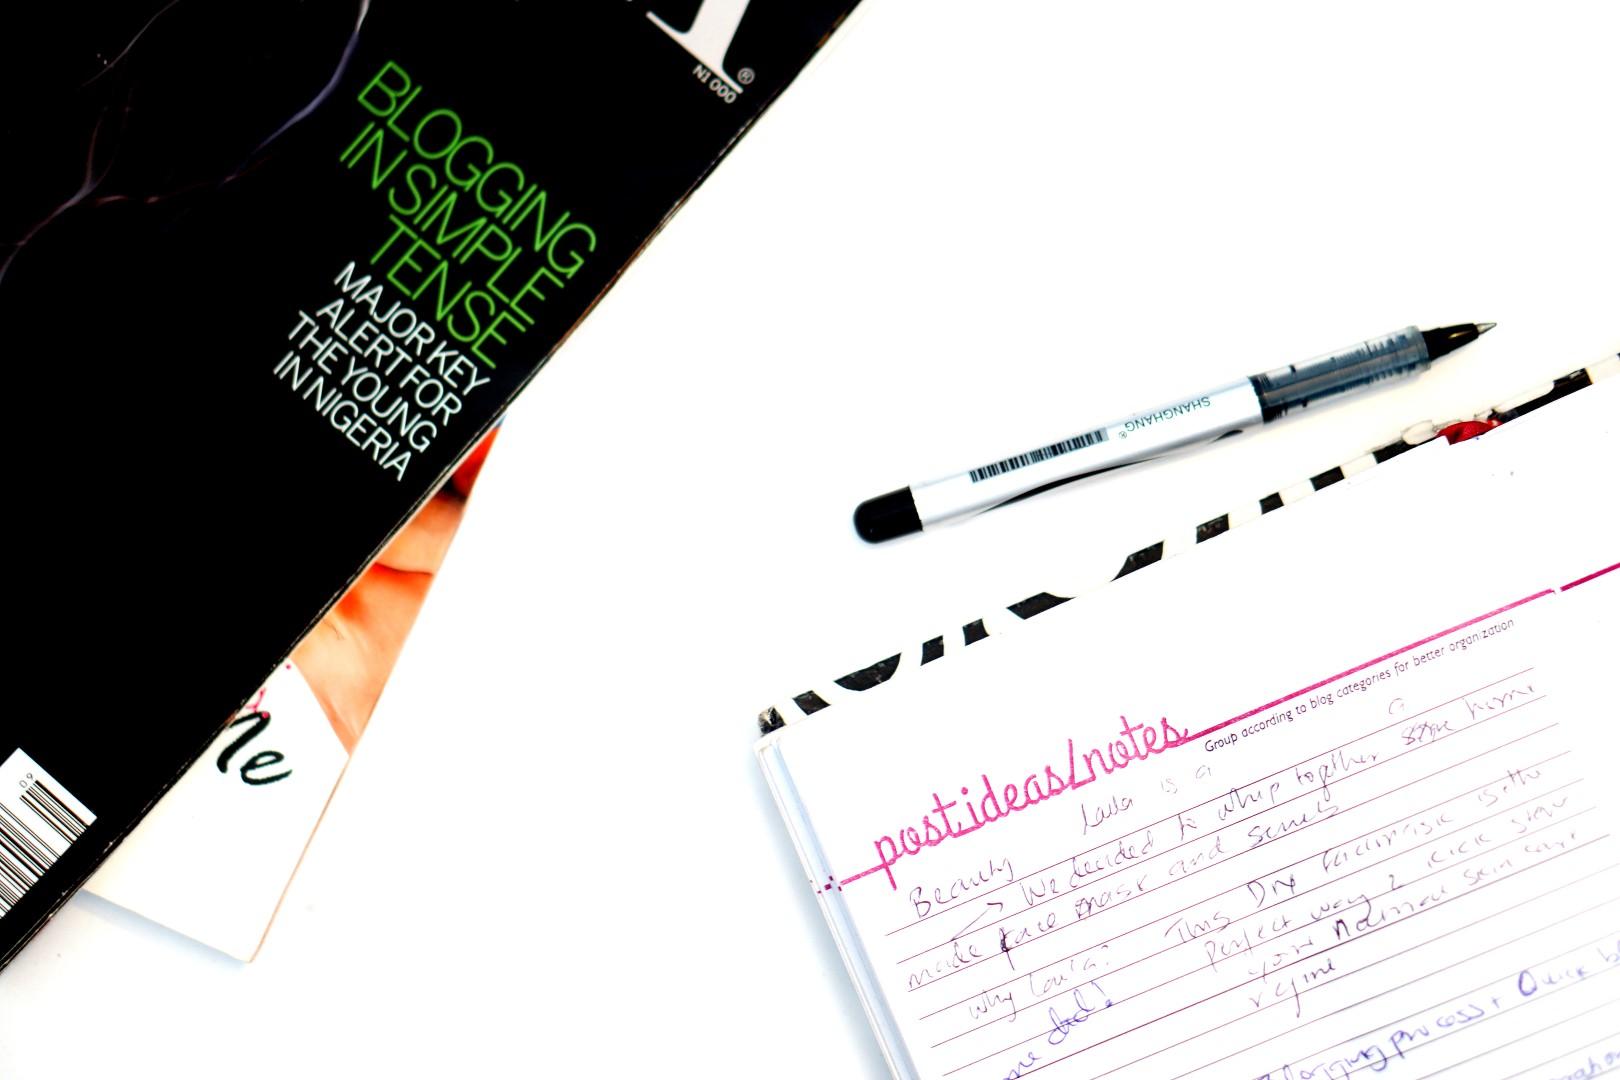 blogging process, cassie daves blog planner image for brainstorming blog posts ideas